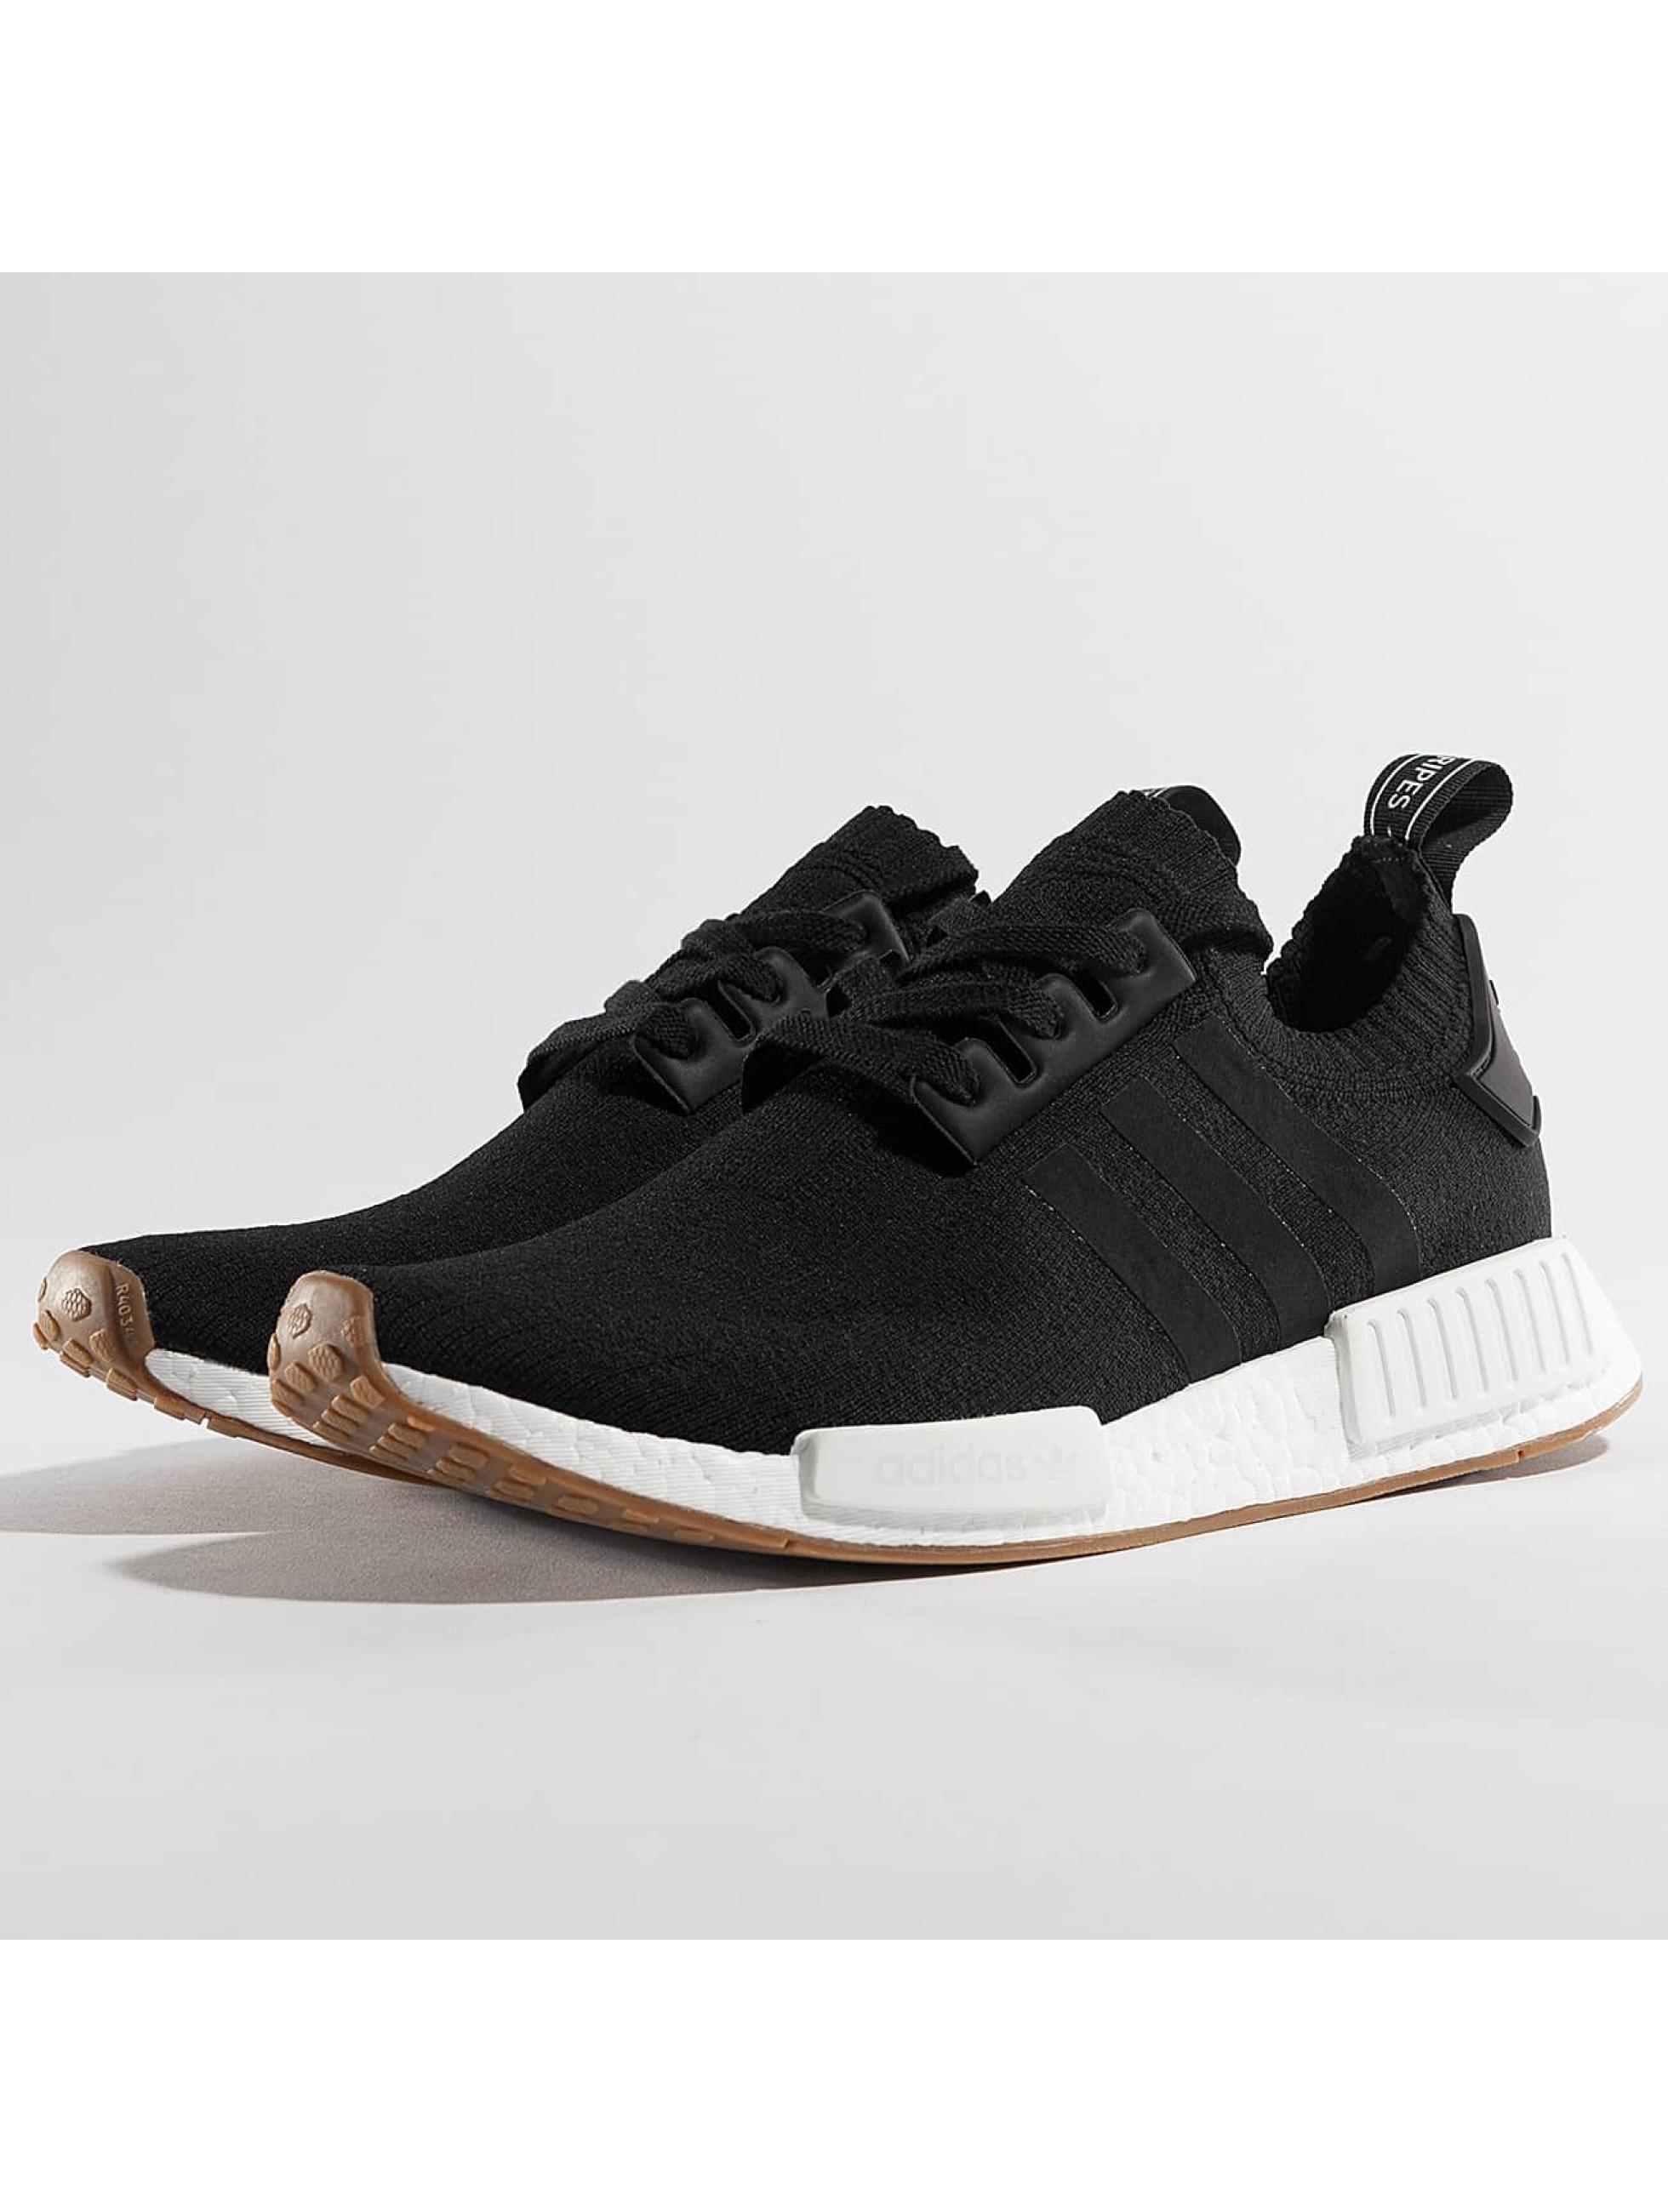 adidas sneaker nmd r1 pk sneakers in schwarz 302798. Black Bedroom Furniture Sets. Home Design Ideas